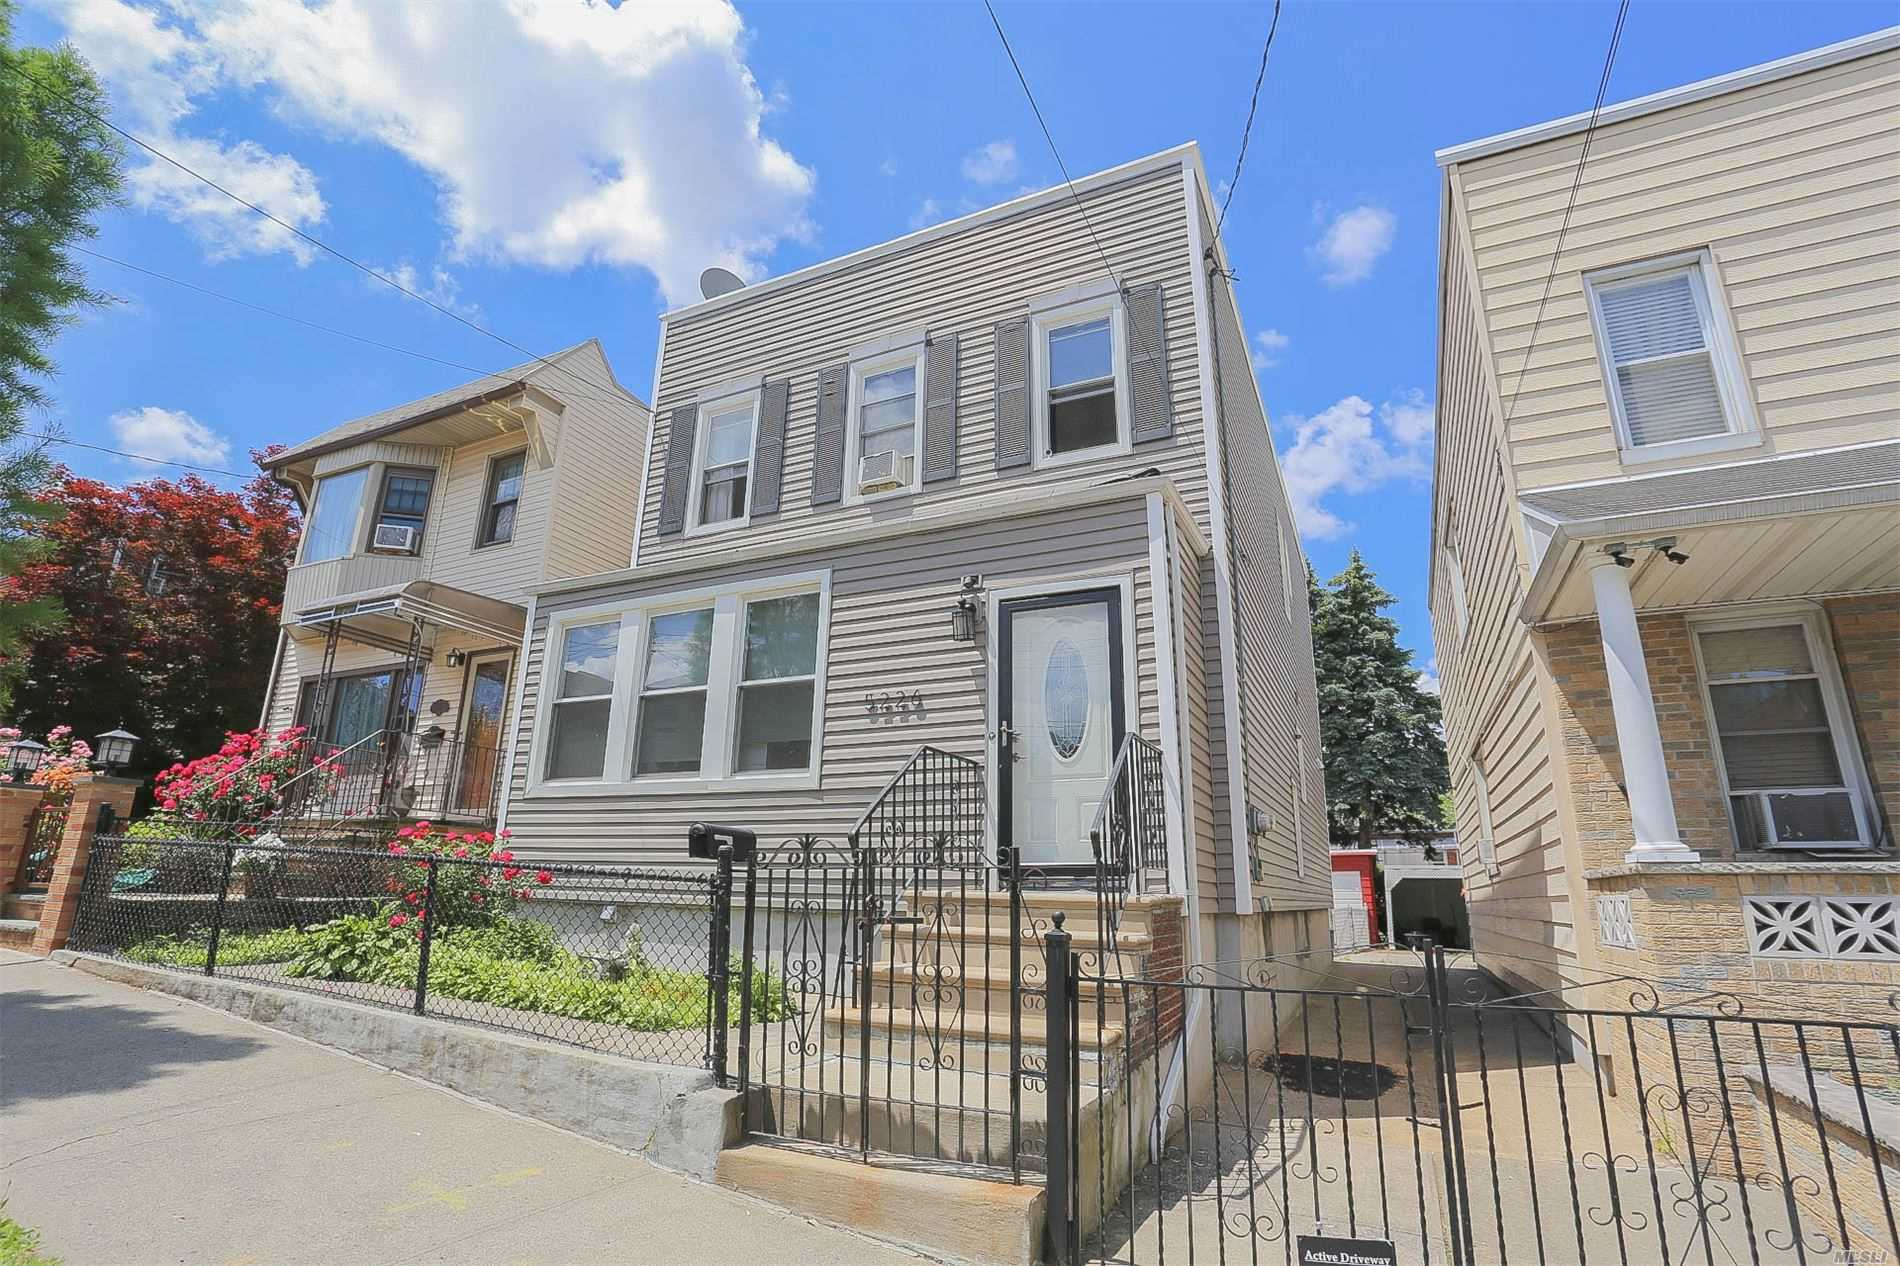 Property for sale at 52-26 70th Street, Maspeth NY 11378, Maspeth,  New York 11378